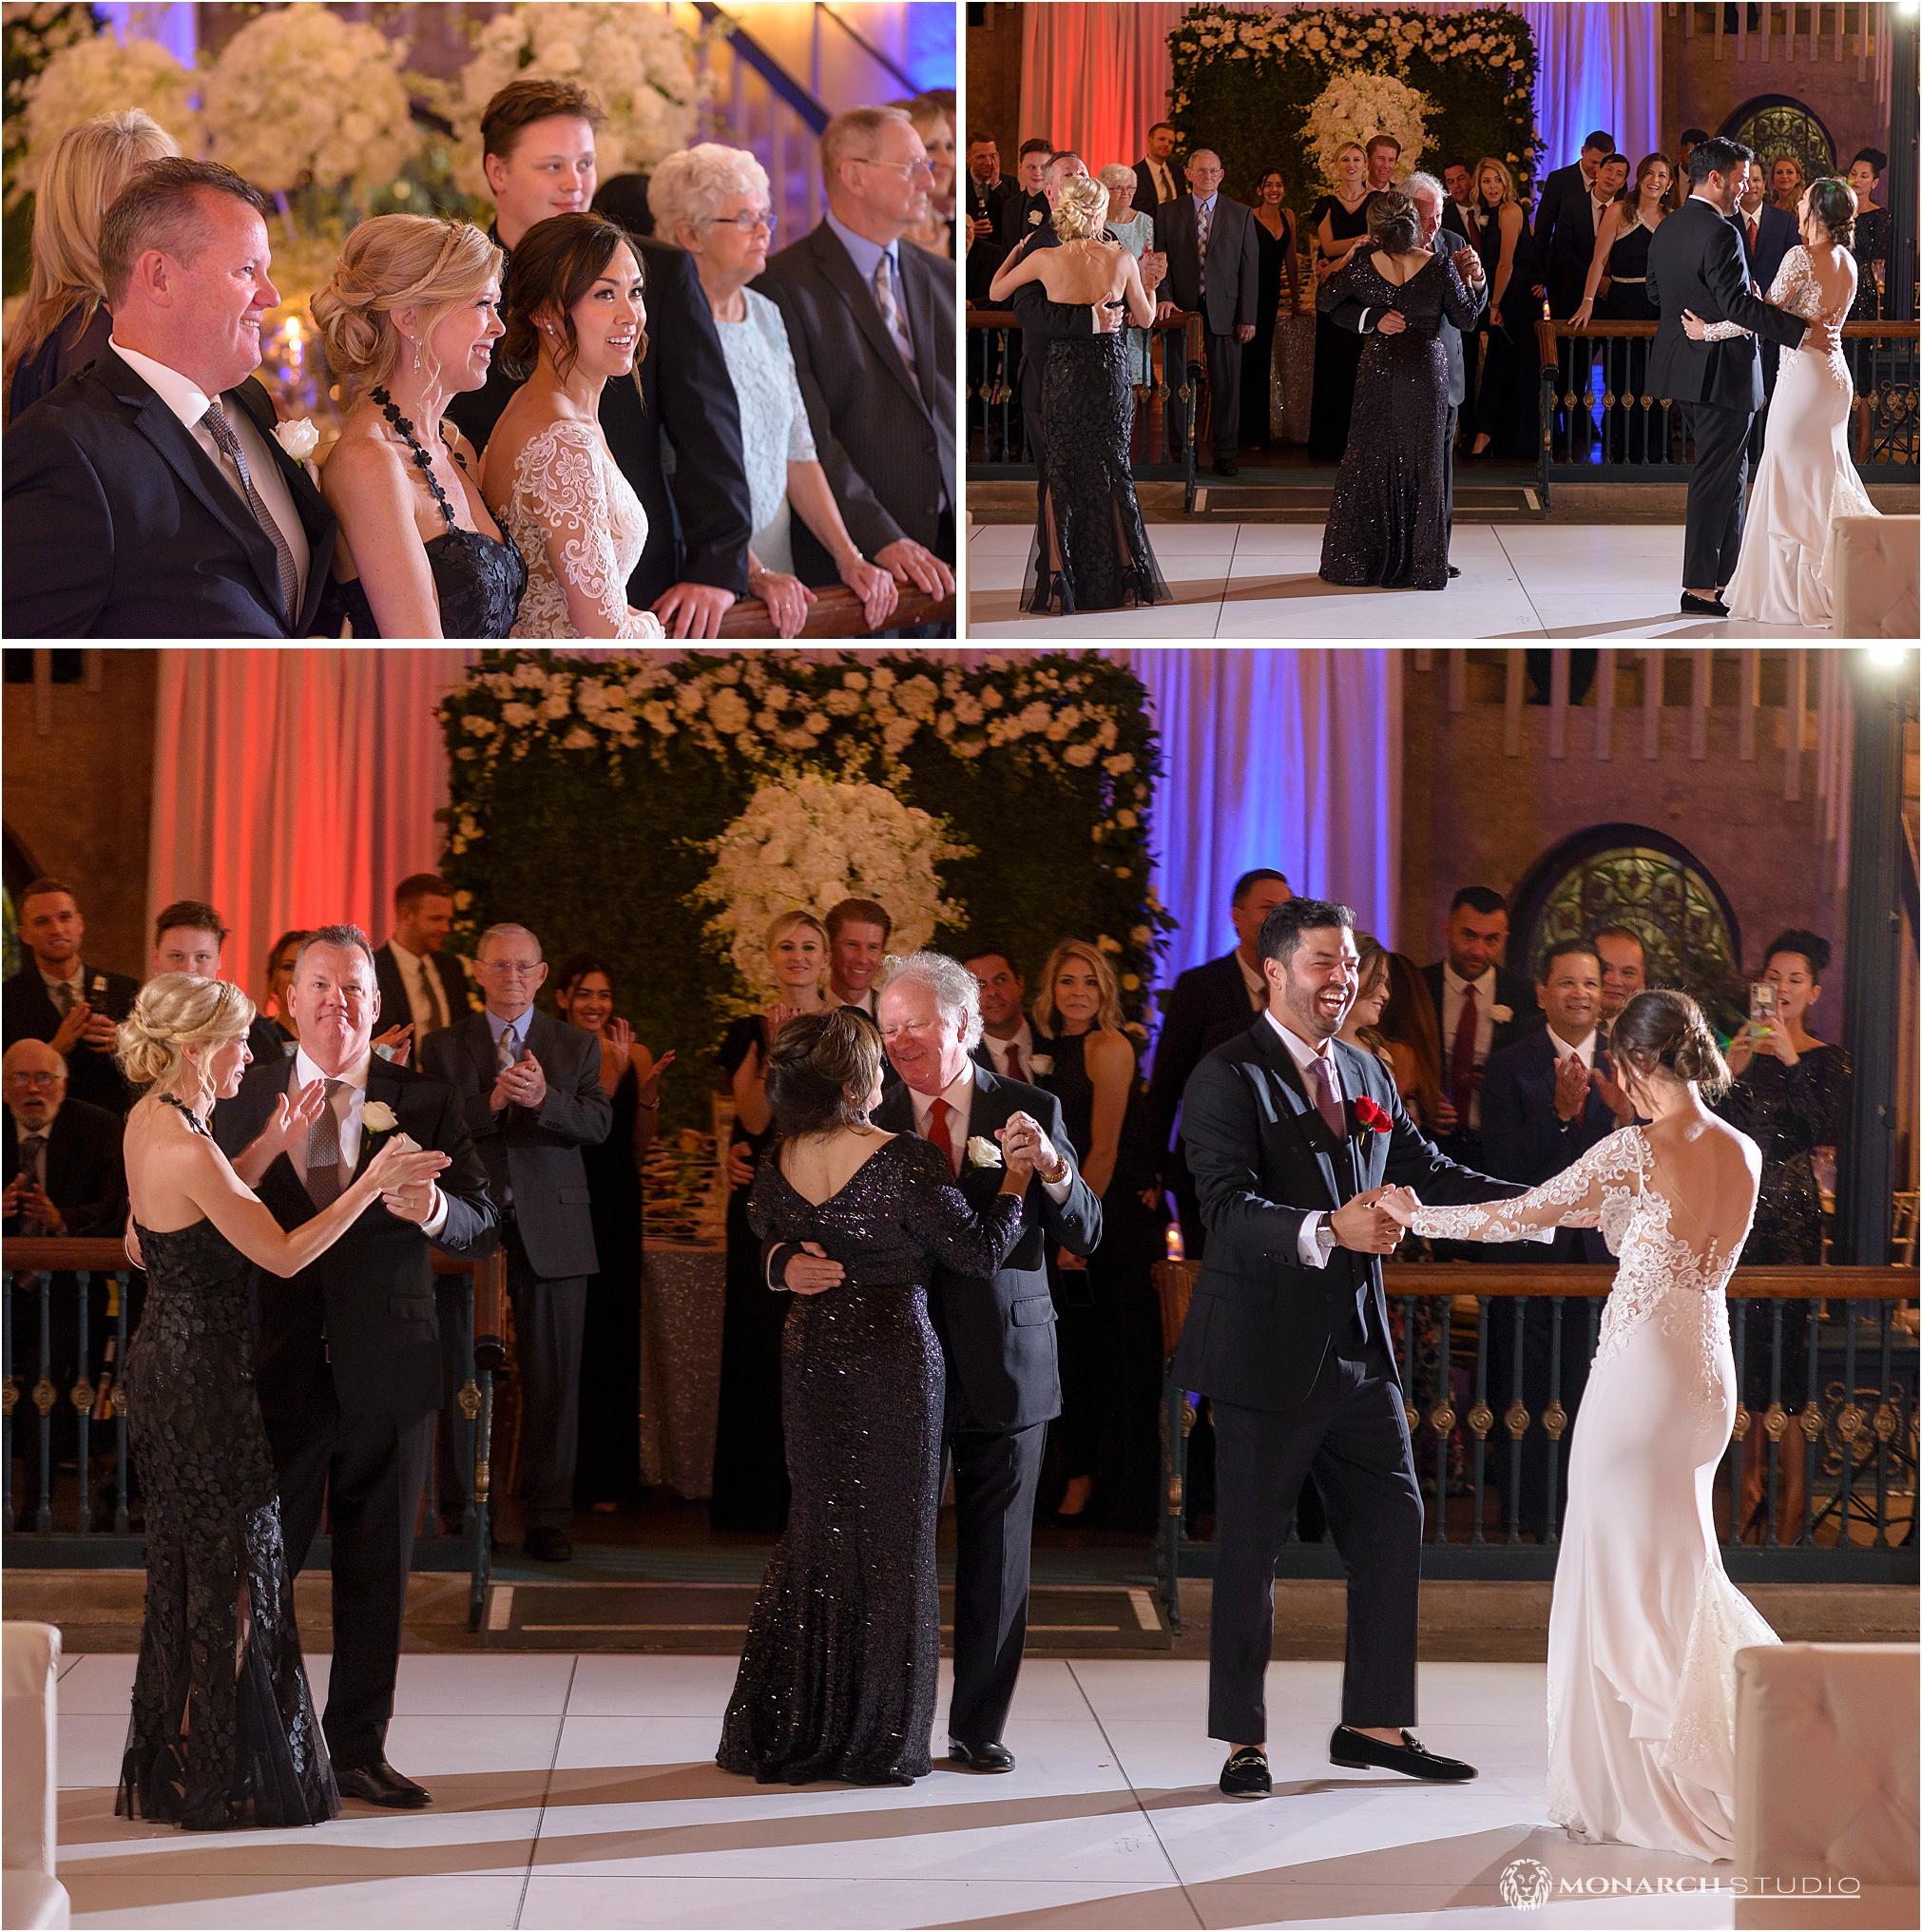 st-augustine-high-end-wedding-photographers-119.jpg